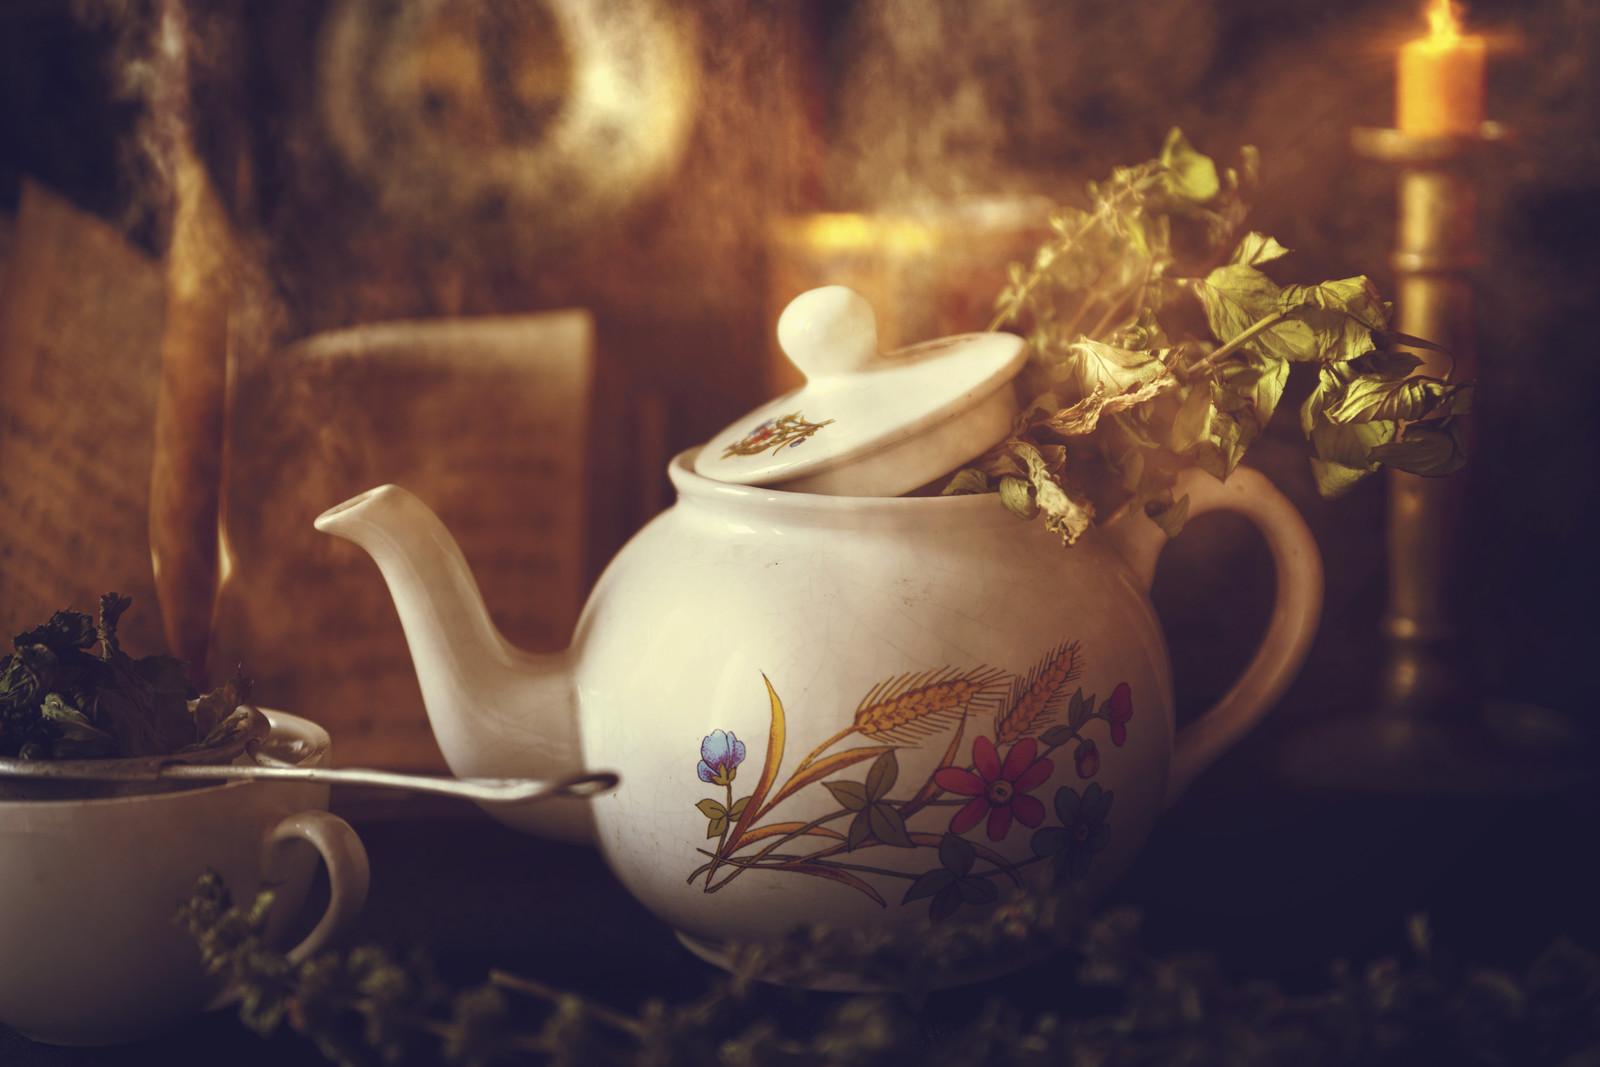 Tea Time's End